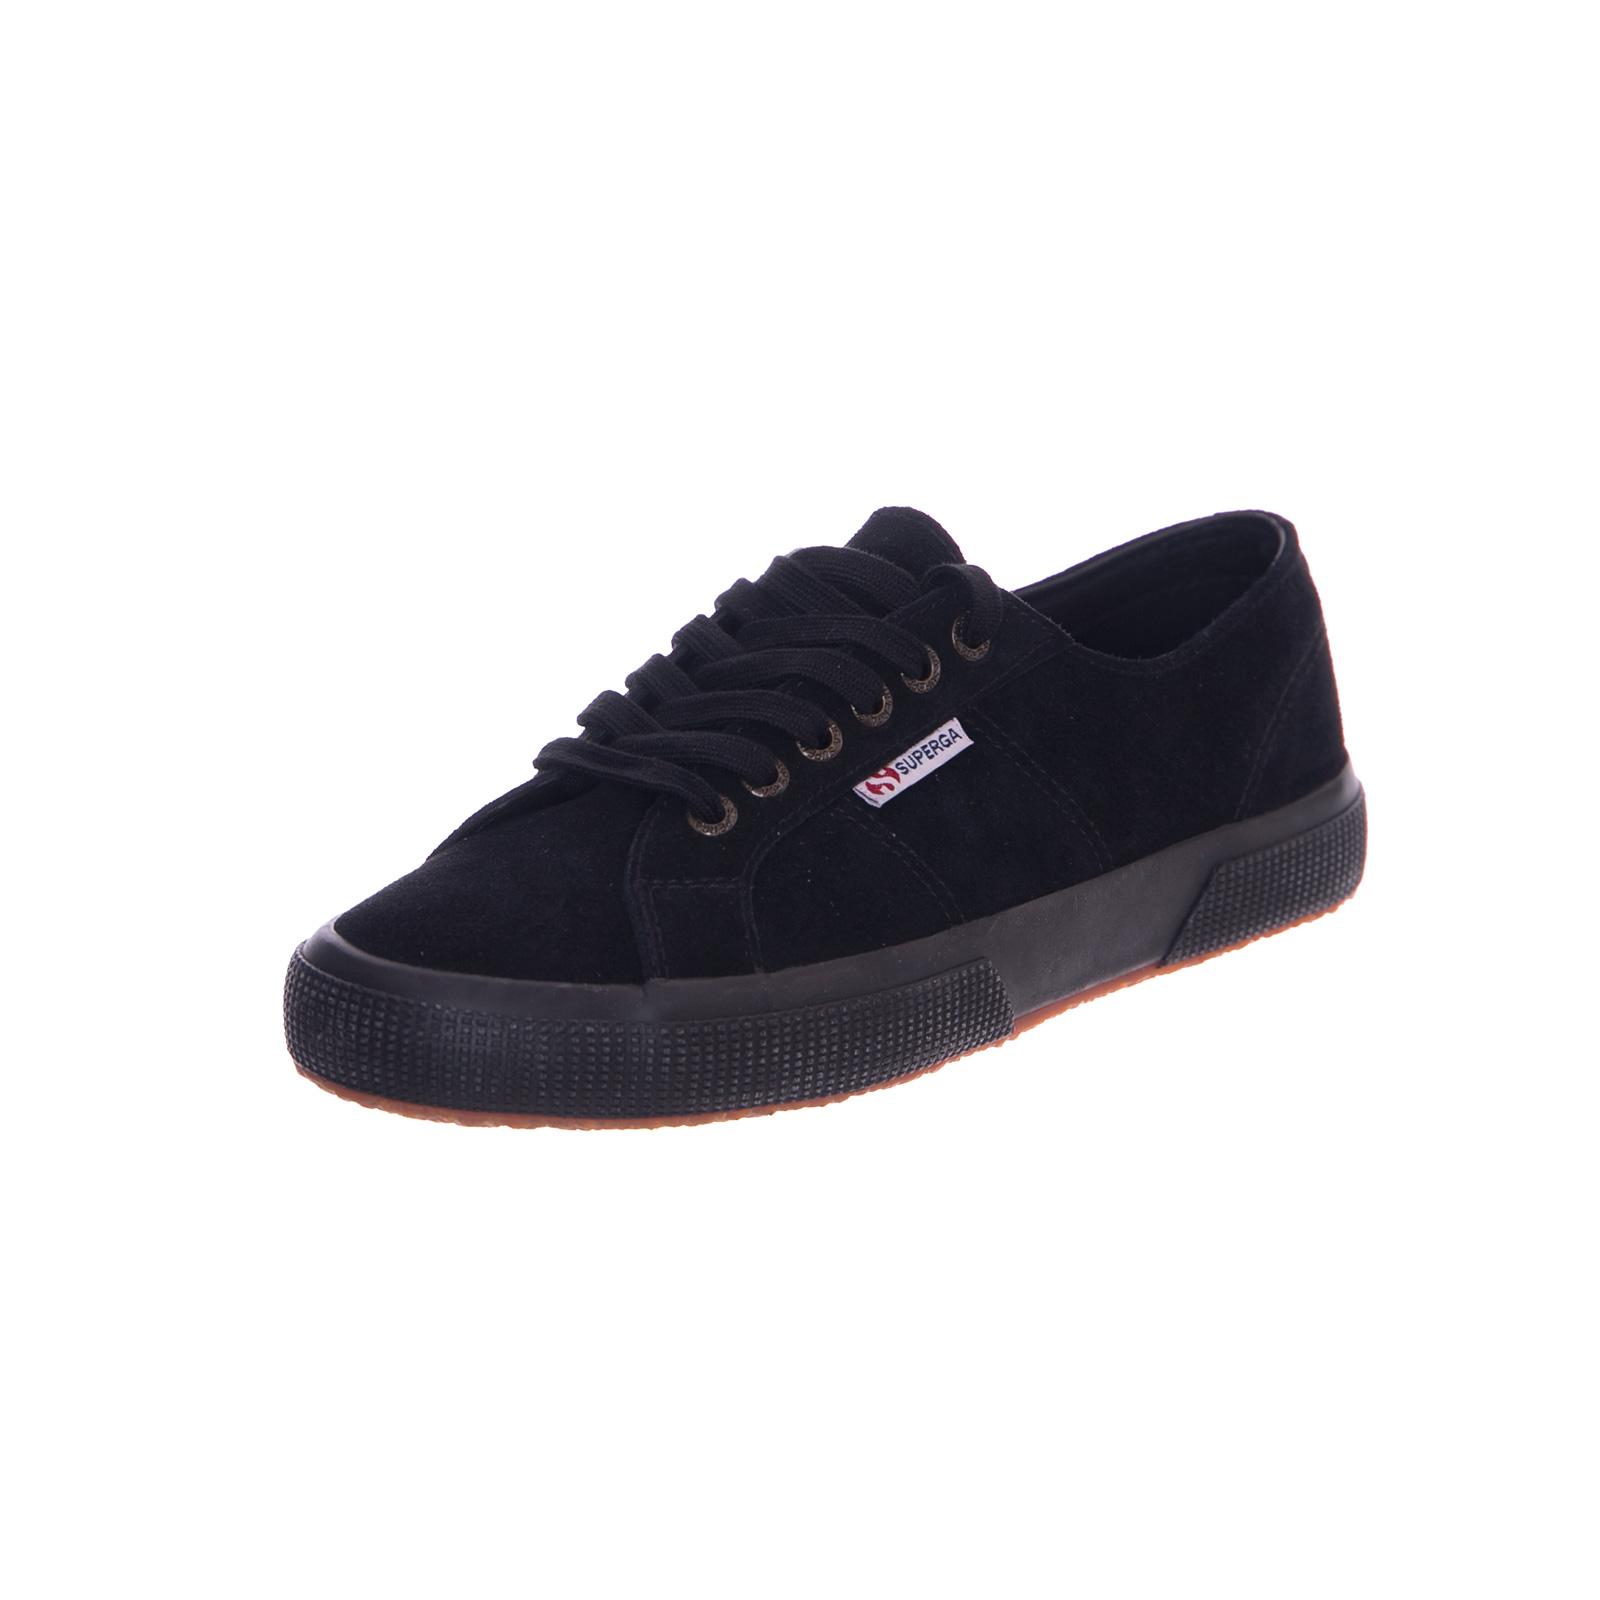 Superga Sneakers Sueu Black black